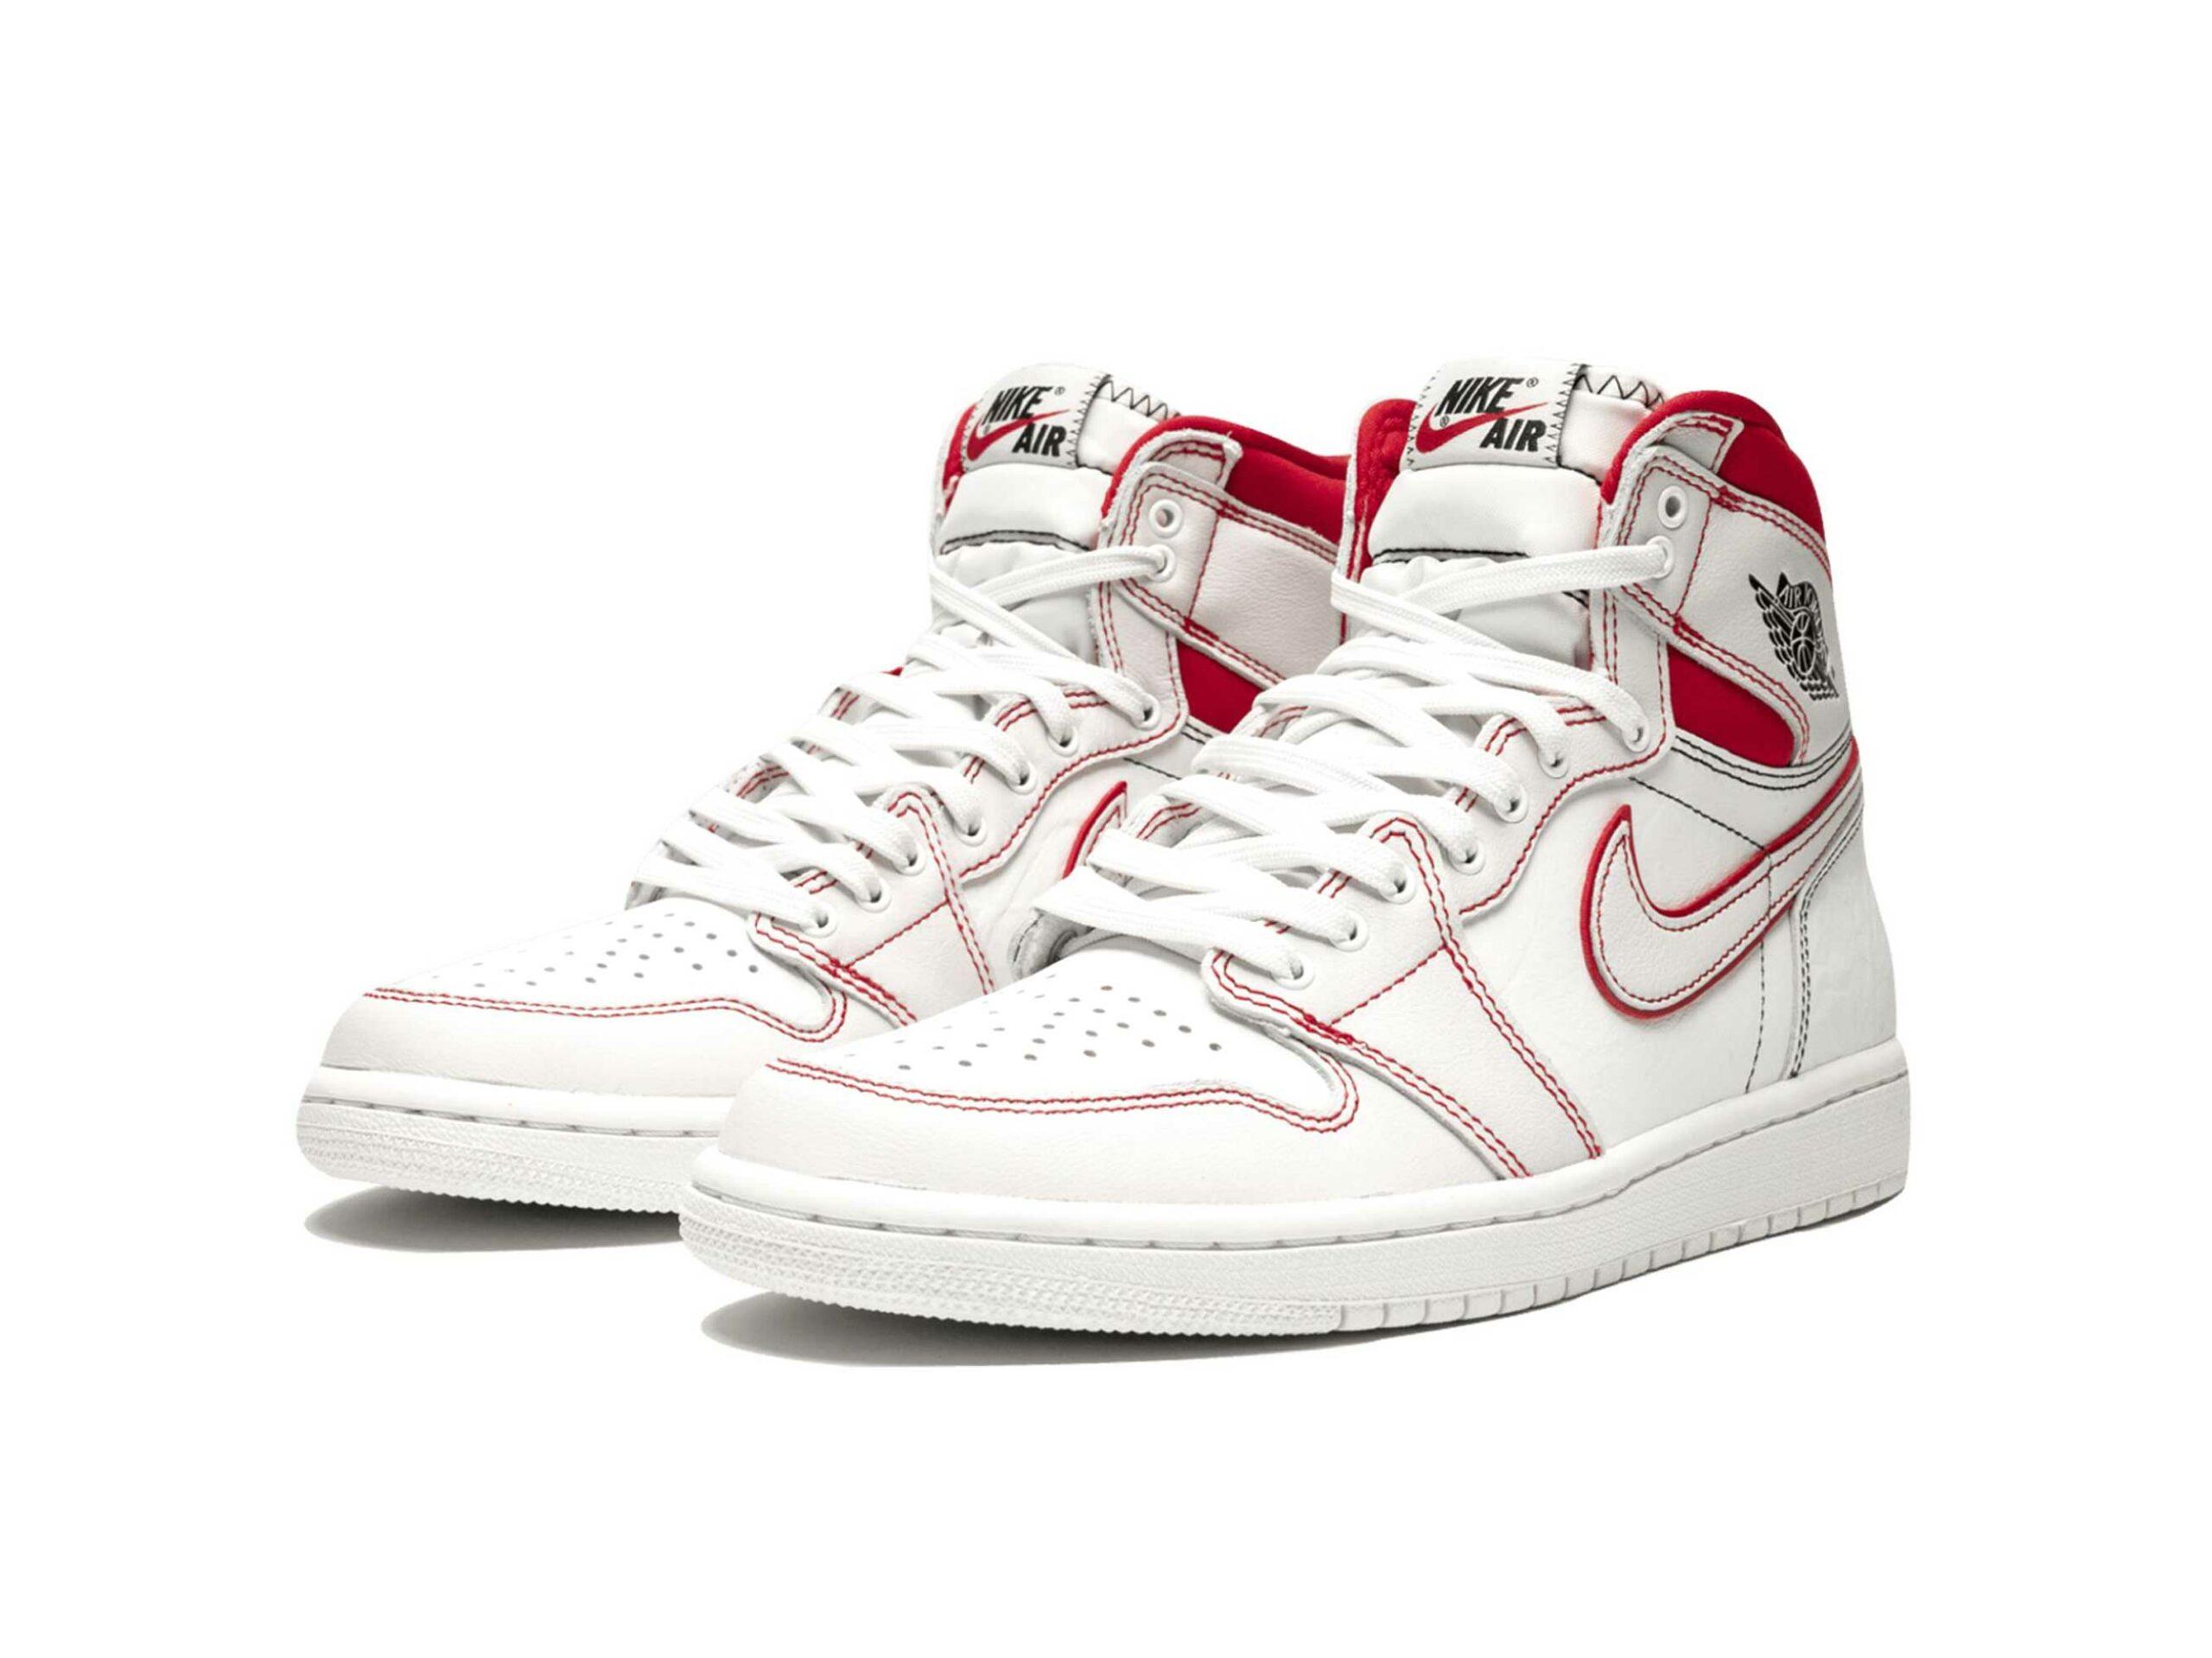 nike air Jordan 1 retro high og phantom 555088_160 купить